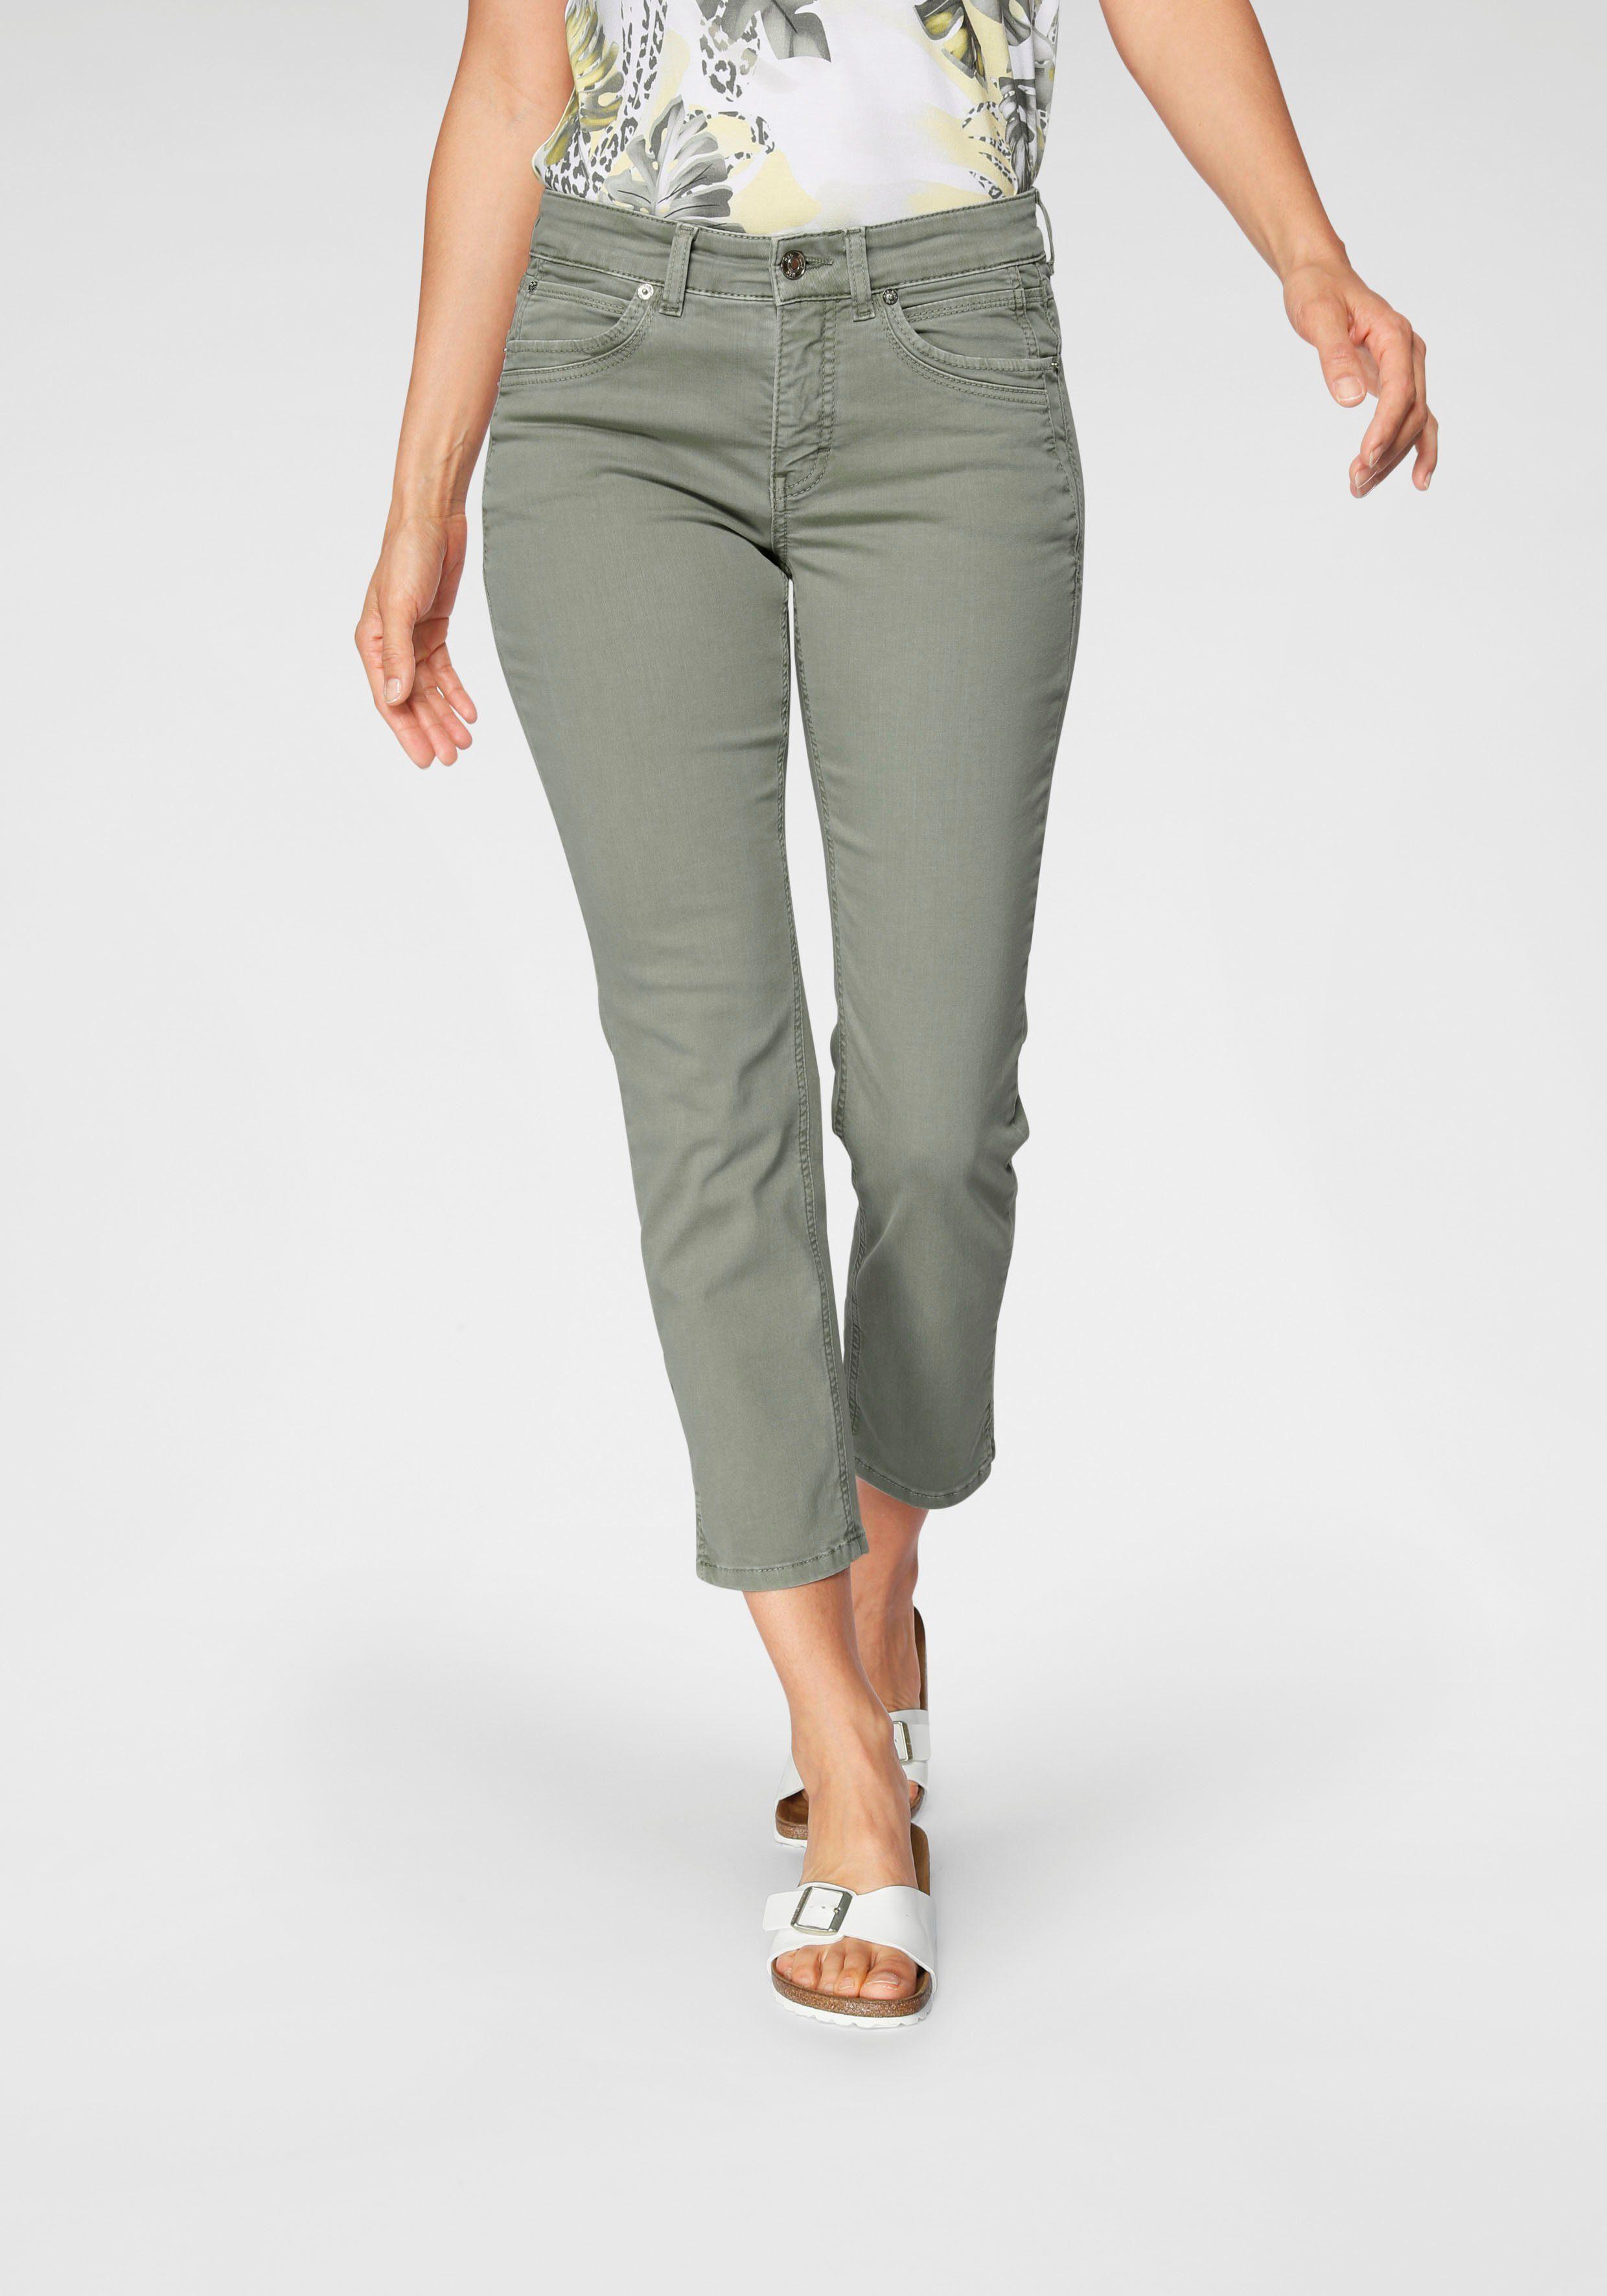 Vero Moda Damen Jeansbluse Langarmbluse Hemdbluse Denim Multi Color Mix